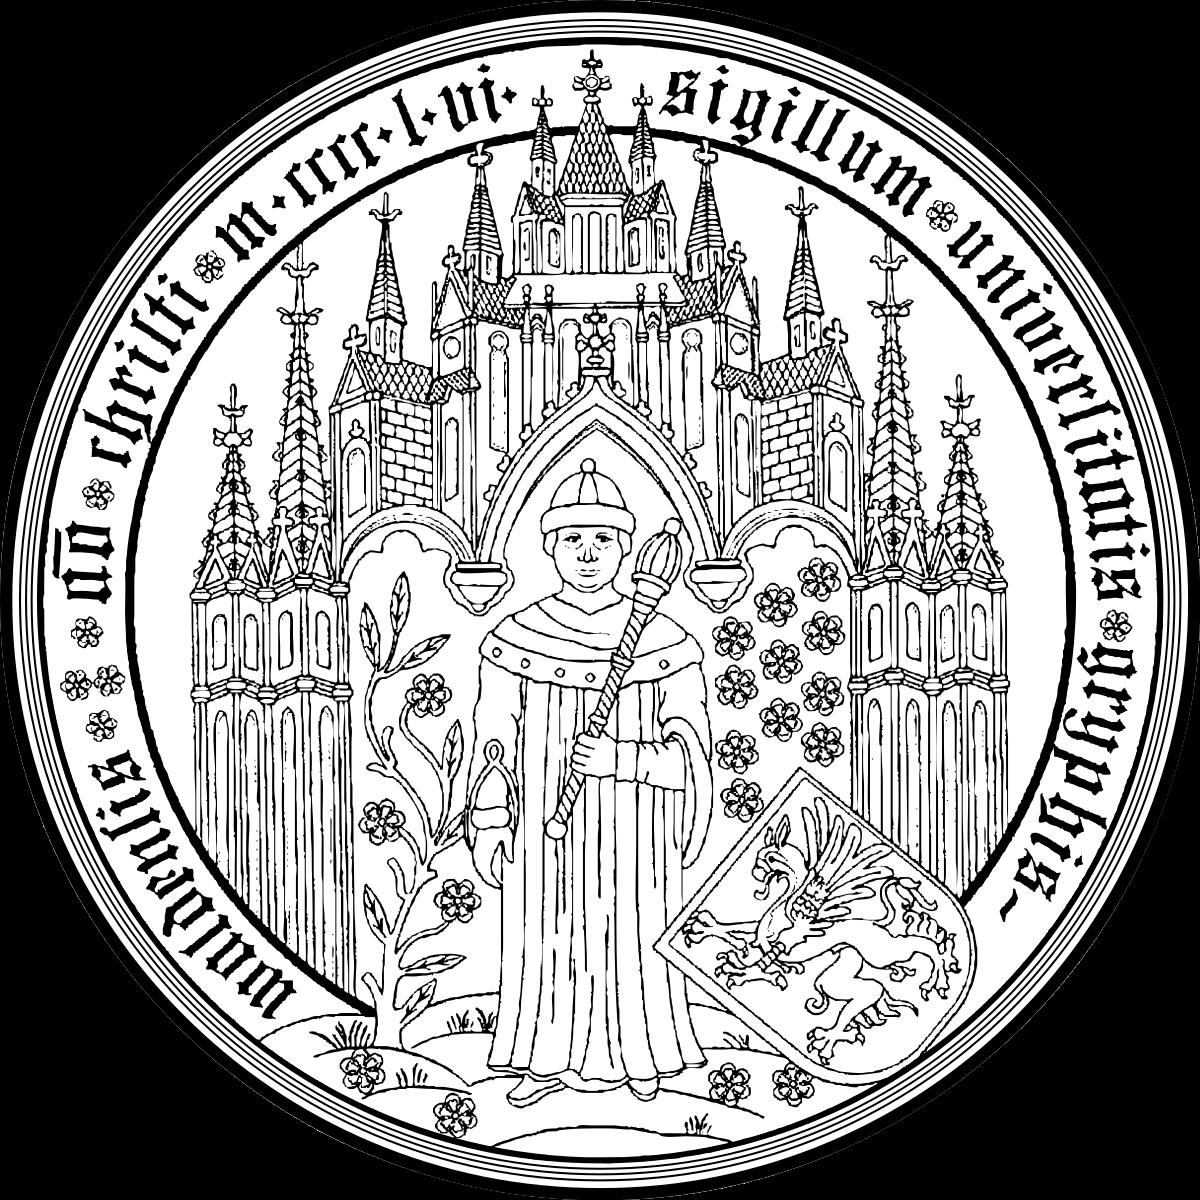 1200x1200 University Of Greifswald